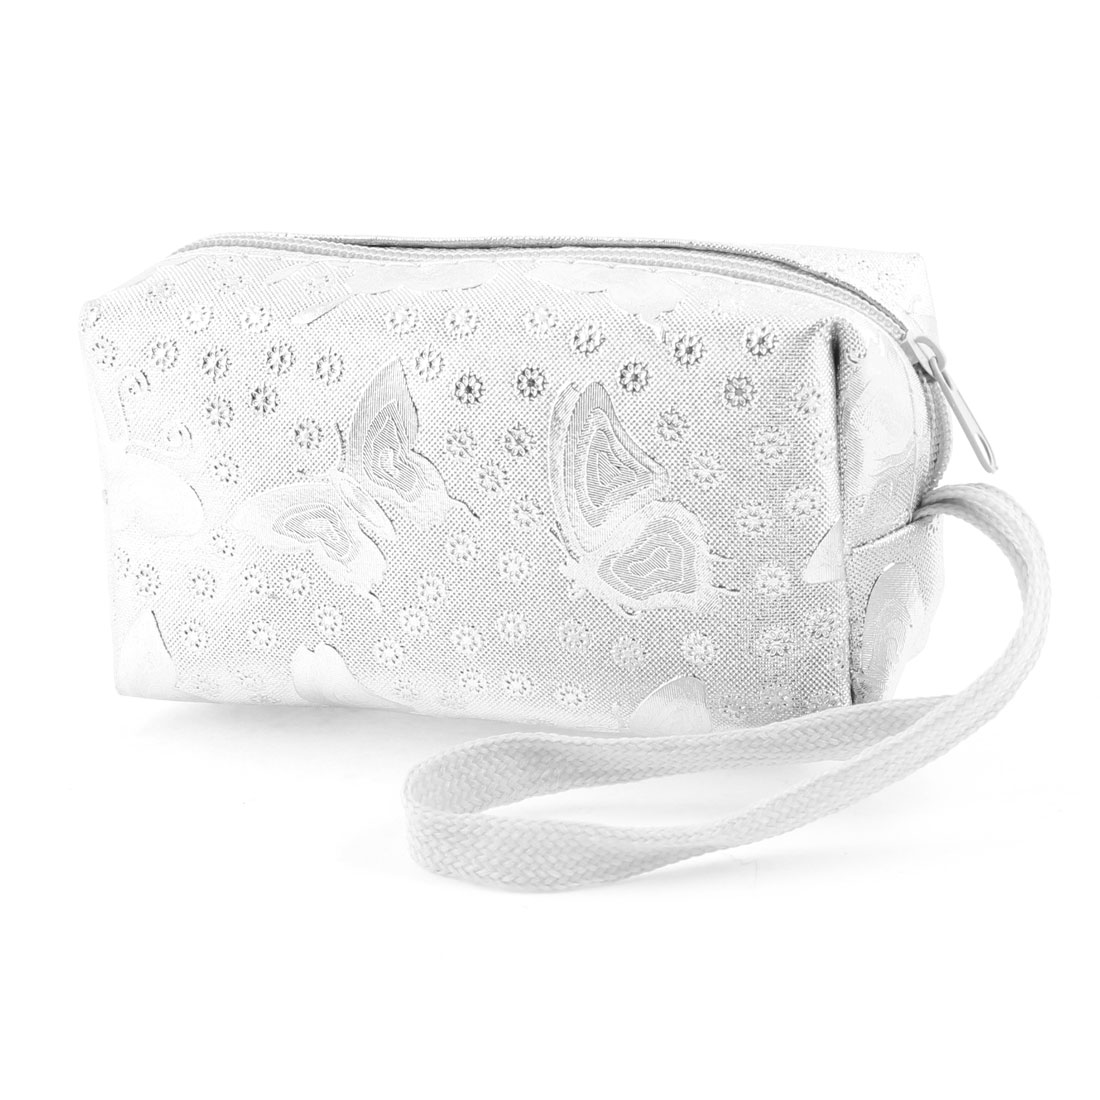 Silver Tone Butterfly Flower Detail Zippered Purse Wallet for Women